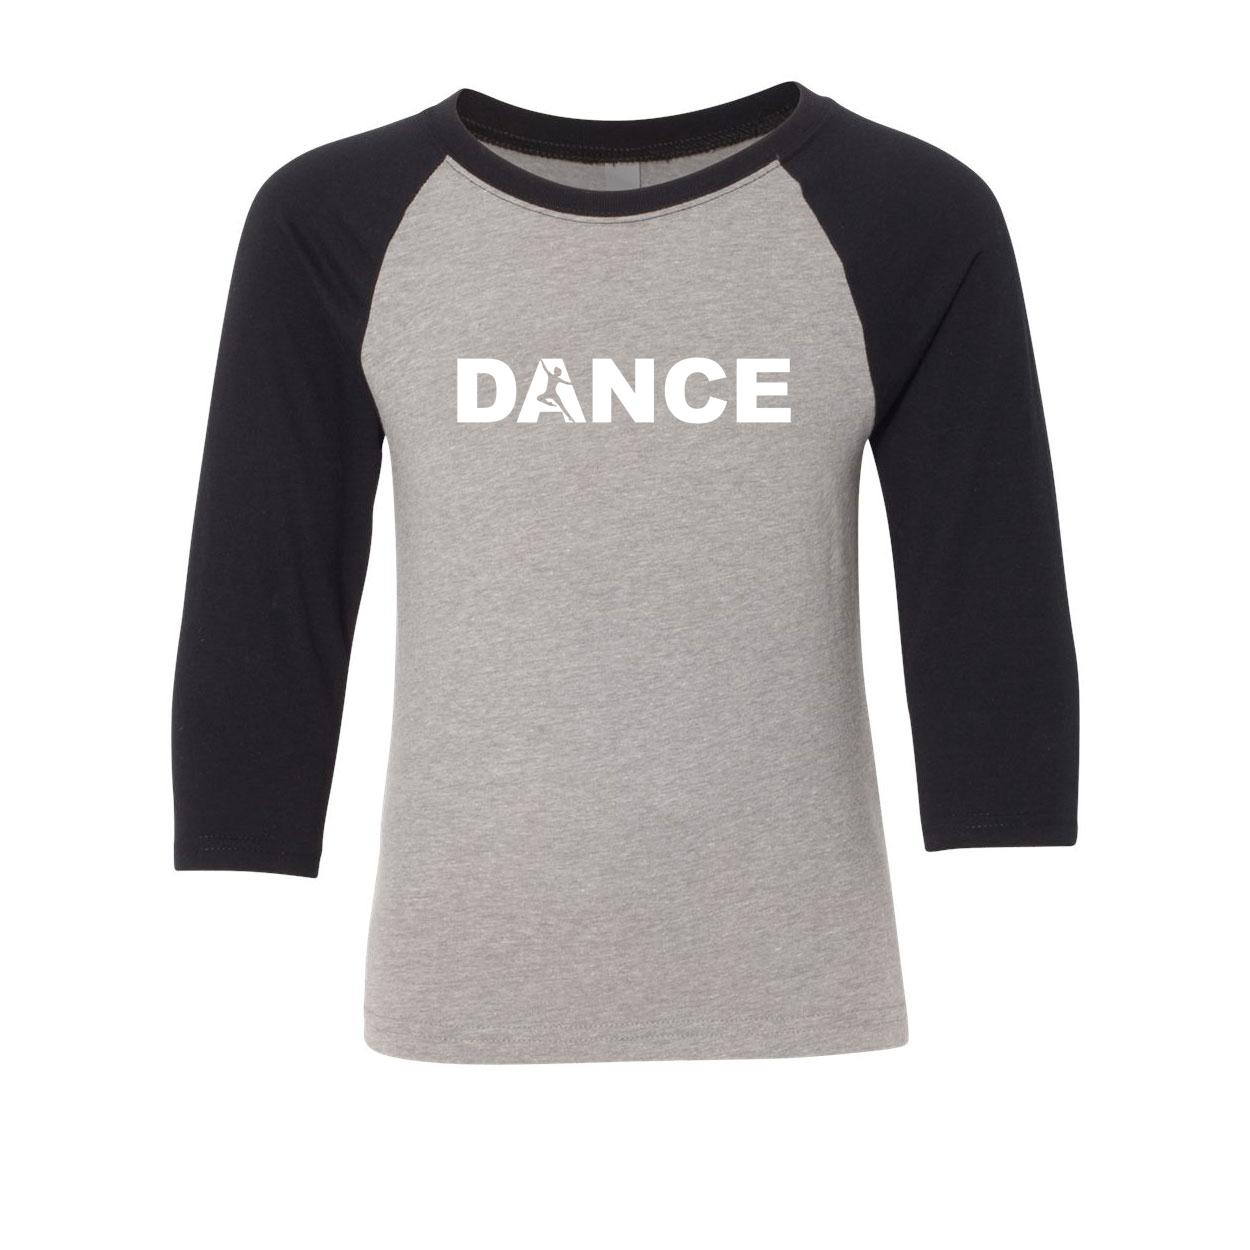 Dance Silhouette Logo Classic Youth Premium Raglan Shirt Gray/Black (White Logo)